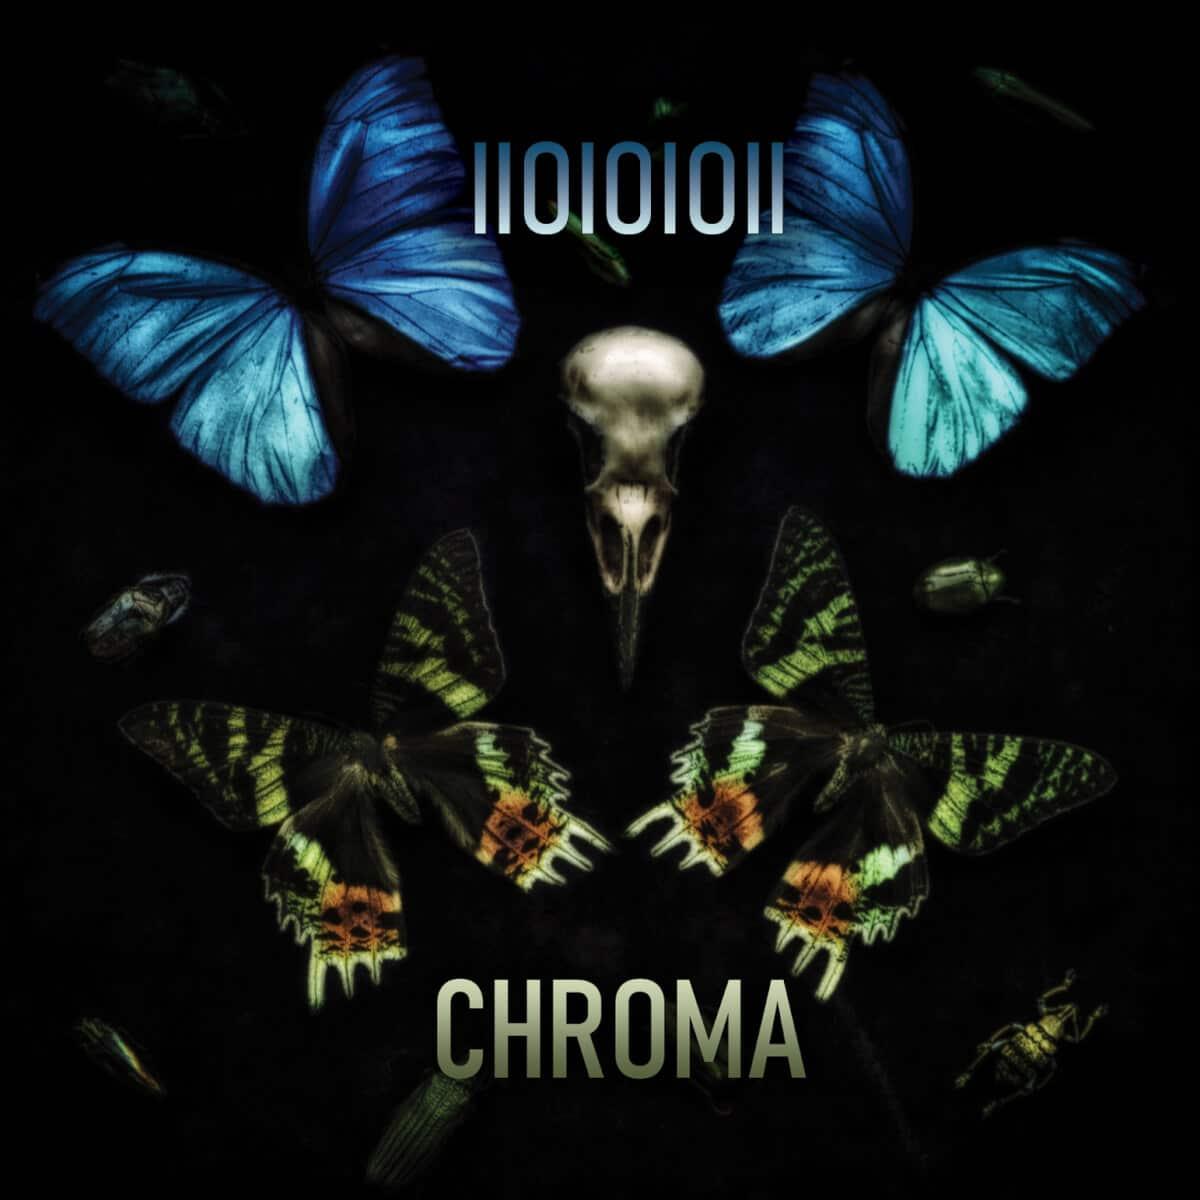 Iioioioii – Chroma